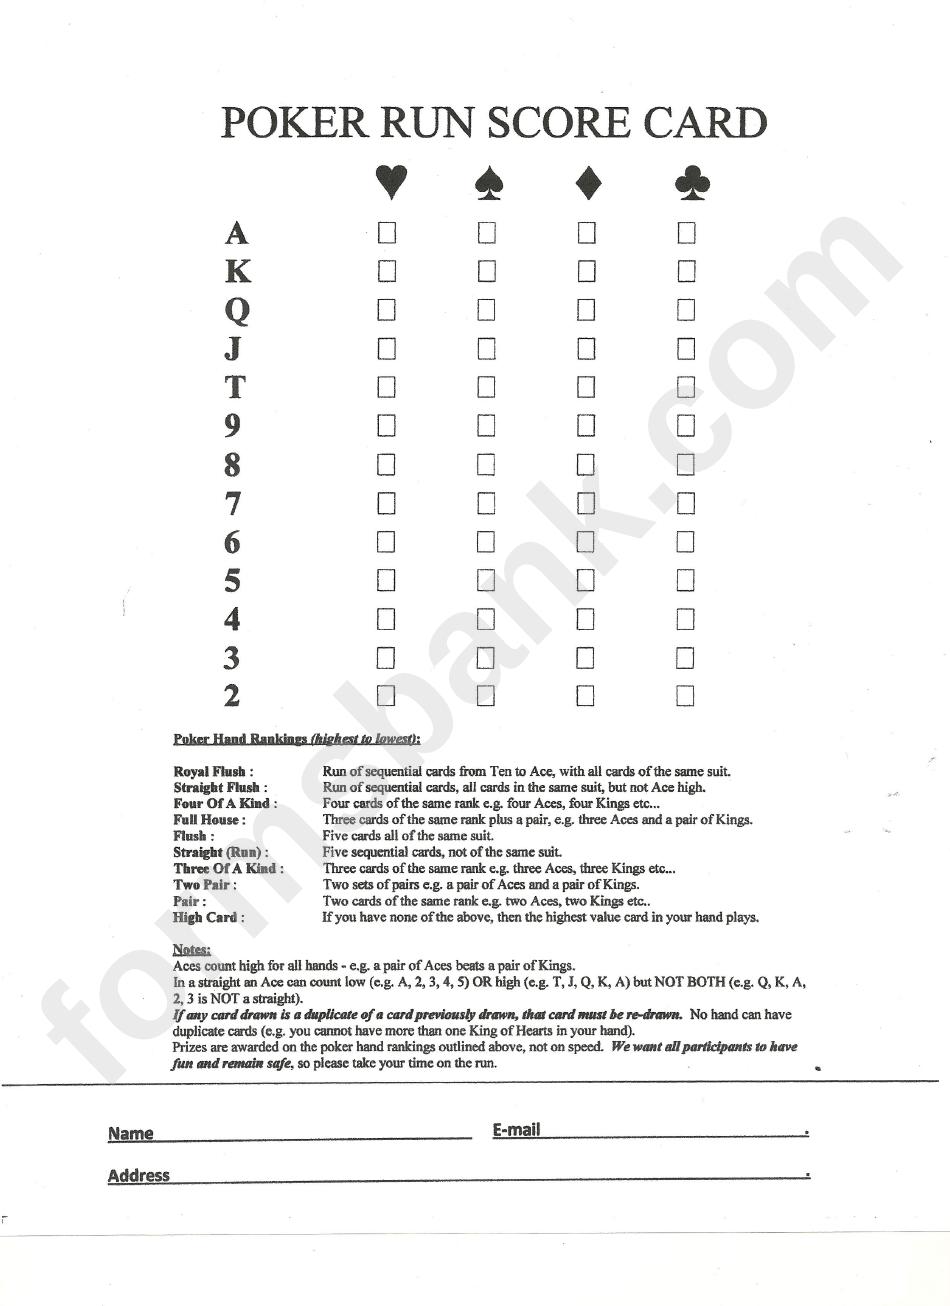 Poker Run Score Card Template printable pdf download